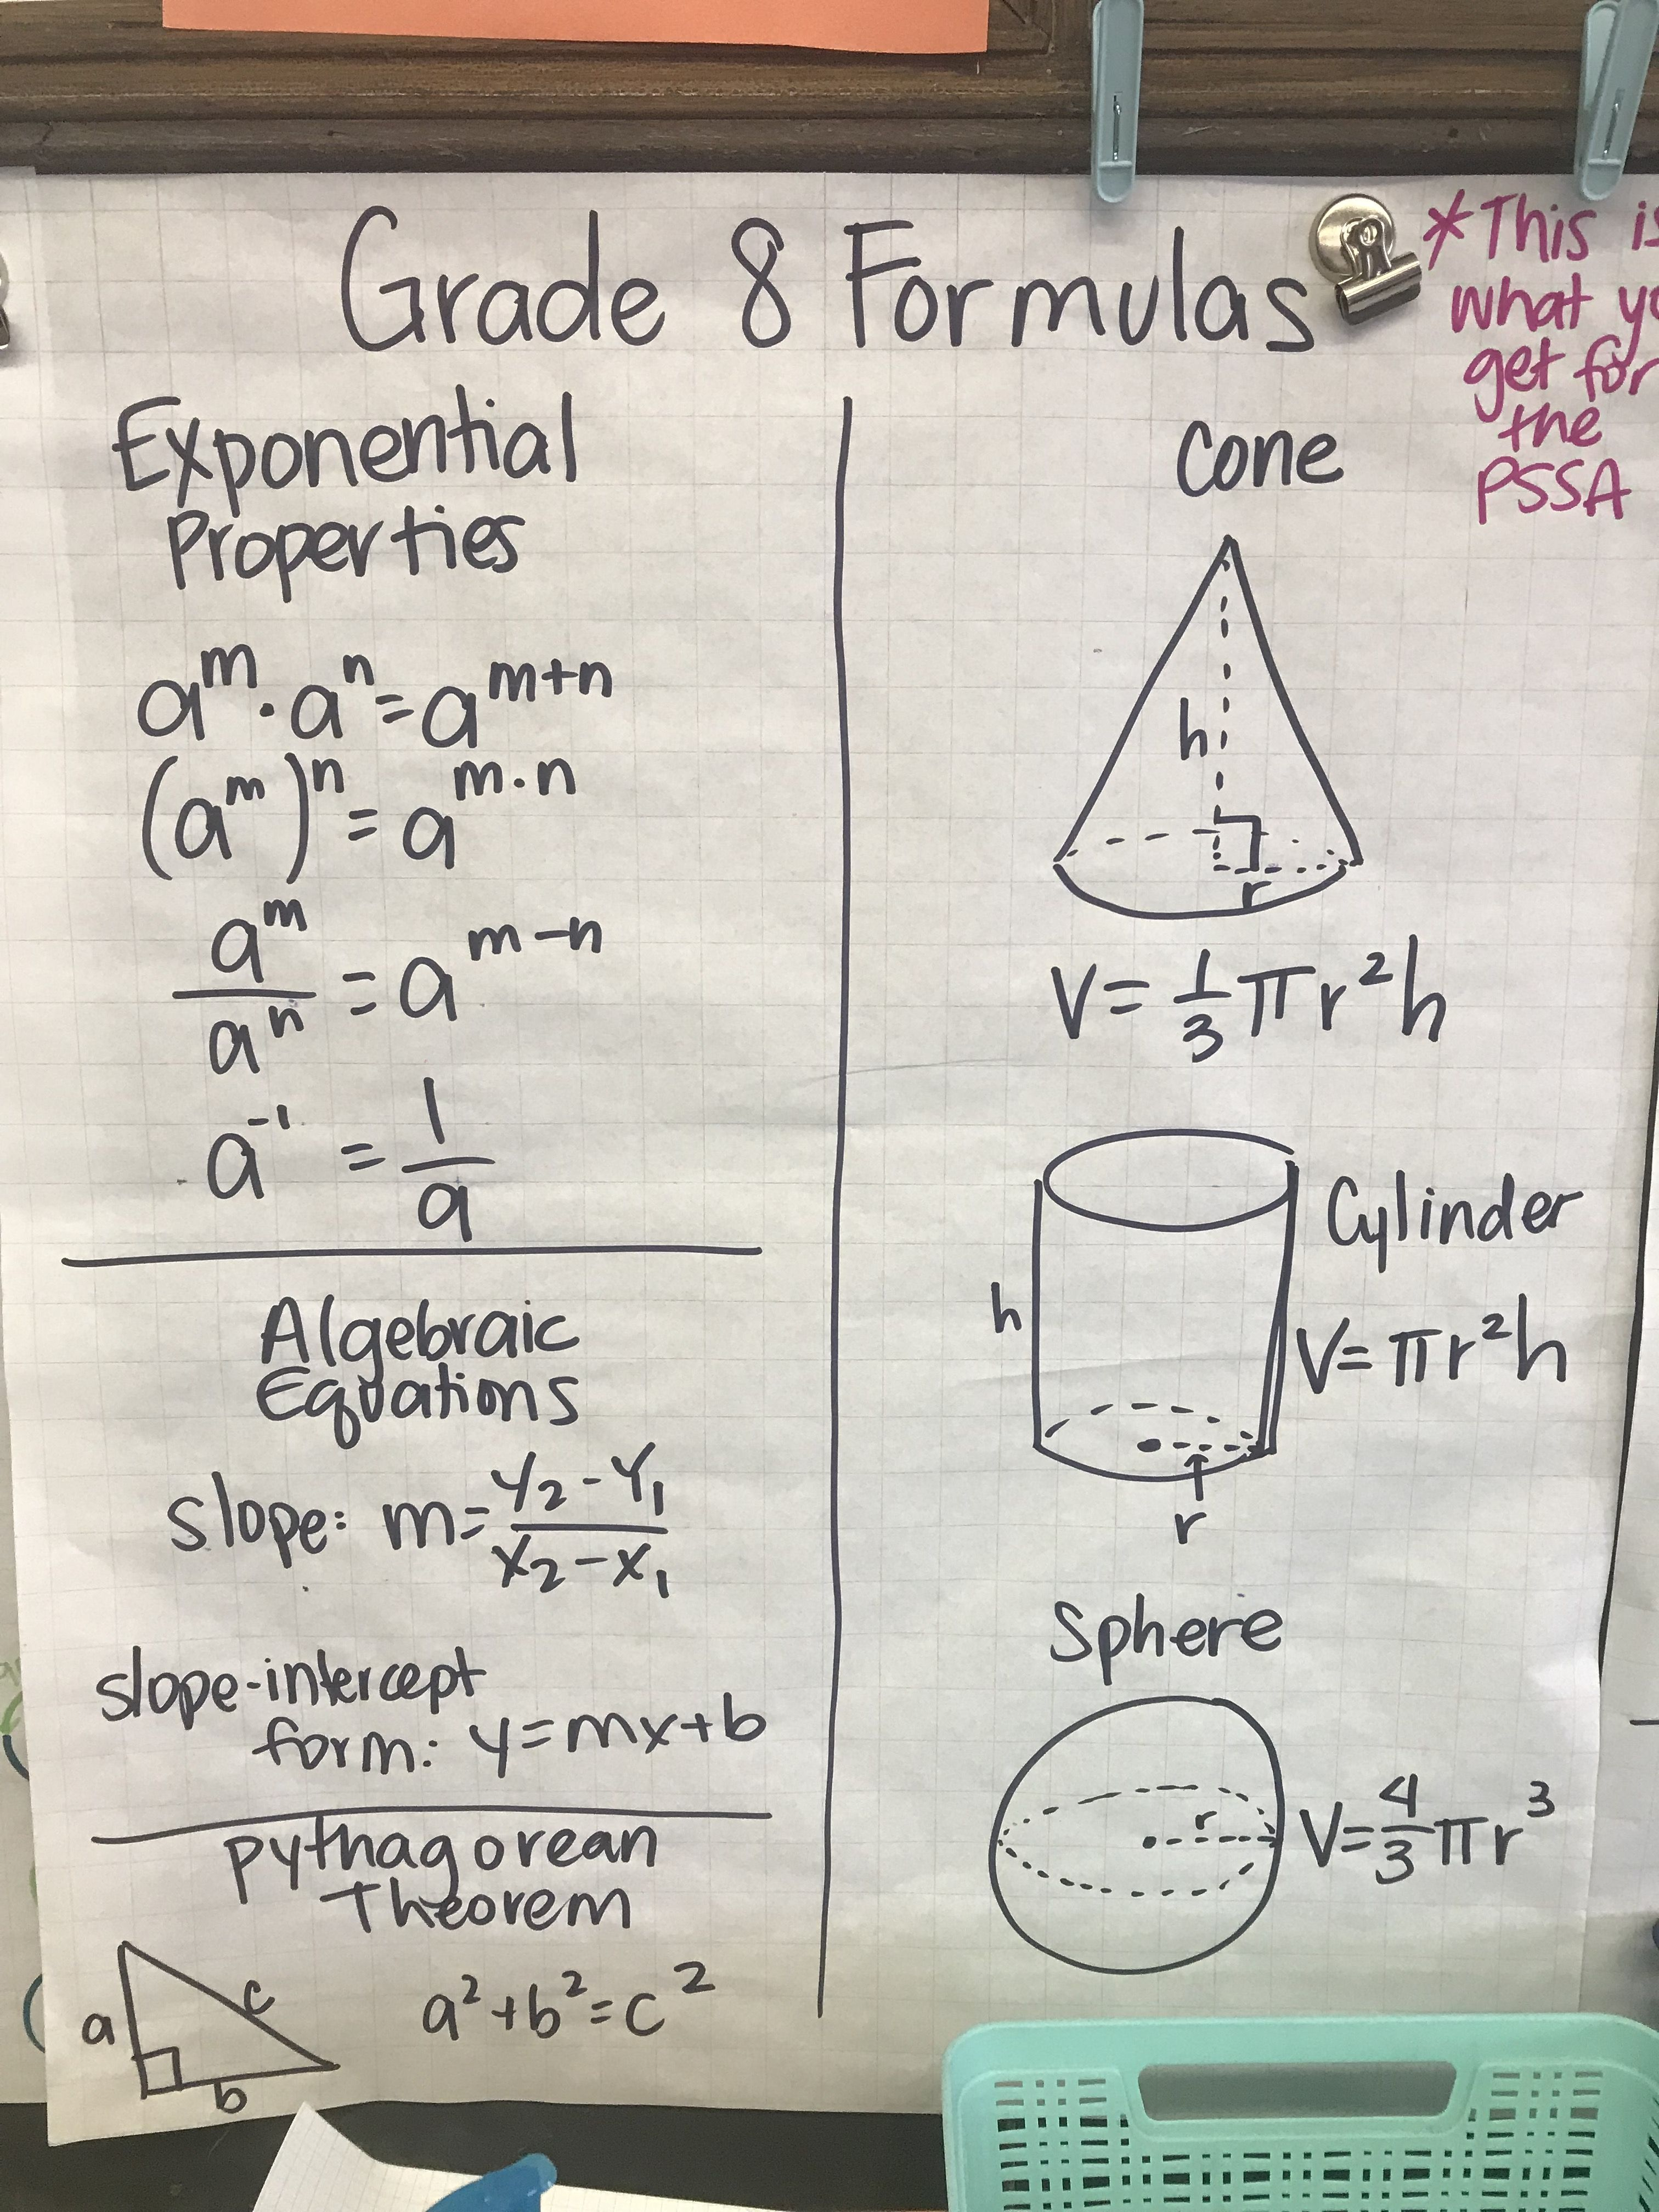 medium resolution of PSSA 8th Grade Formula Sheet anchor chart (photo only)   8th grade math